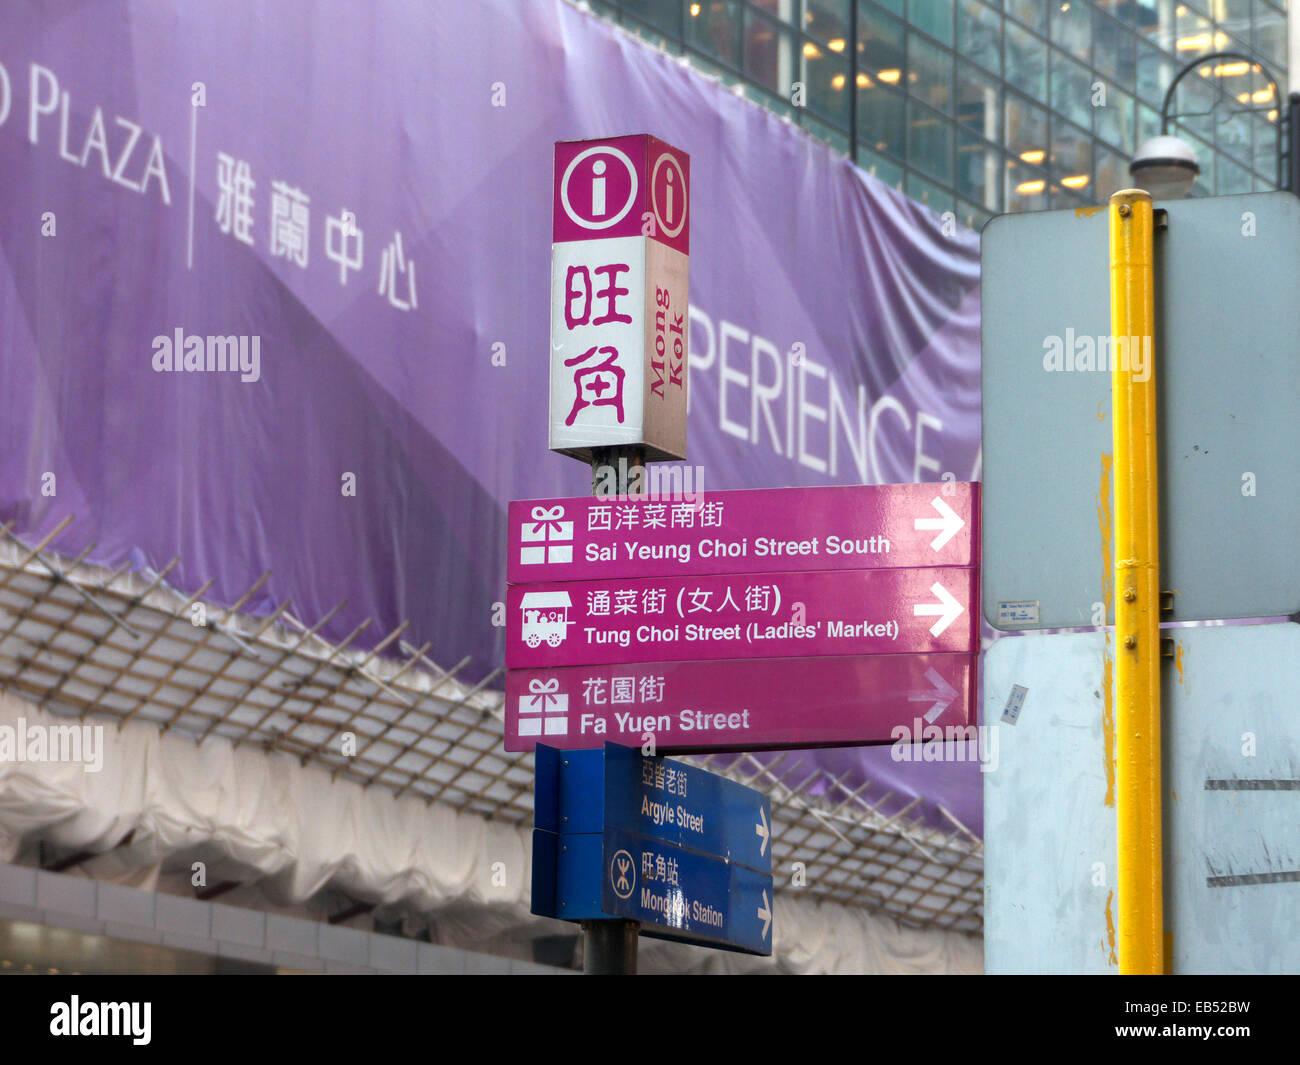 China Hong Kong Mong Kok Sai Yeung Choi street Tung Choi Street Ladies' market Fa Yuen Street street sign - Stock Image